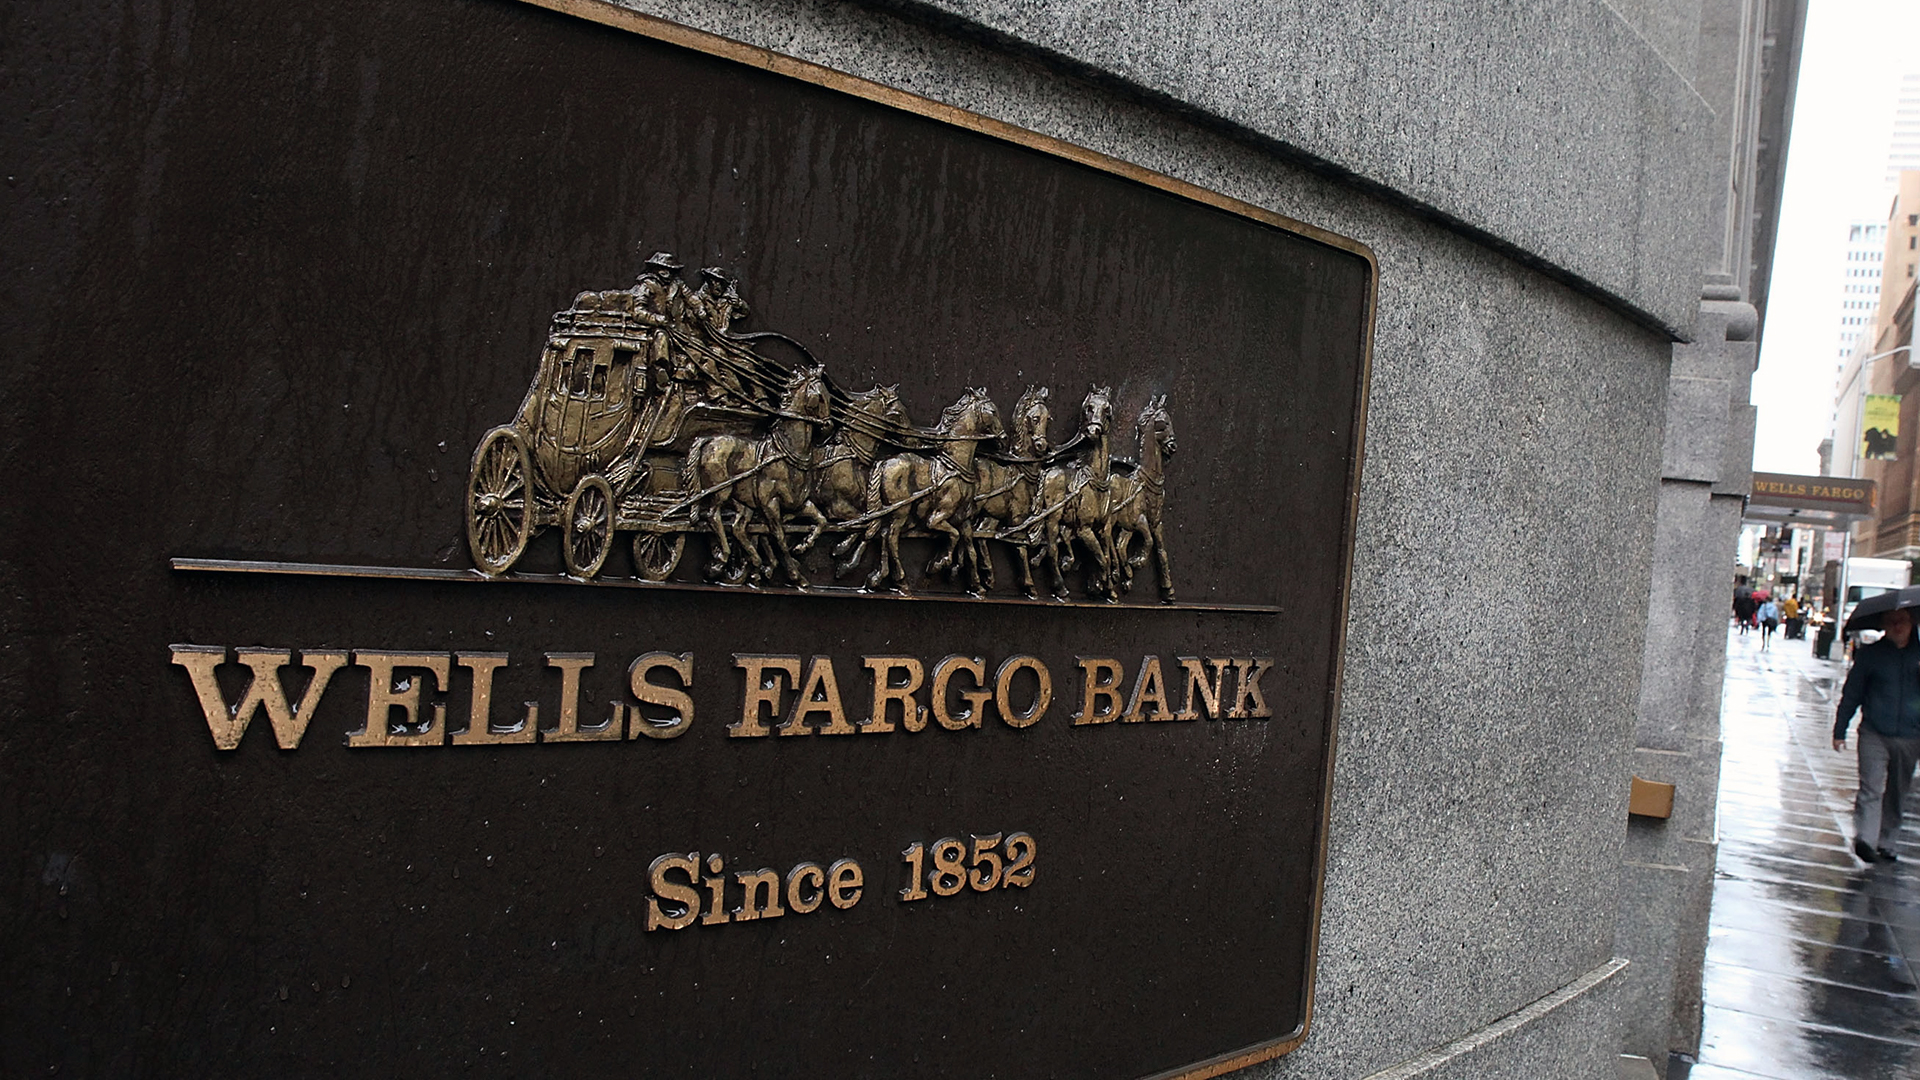 Wells Fargo Bank sign-159532.jpg94756550